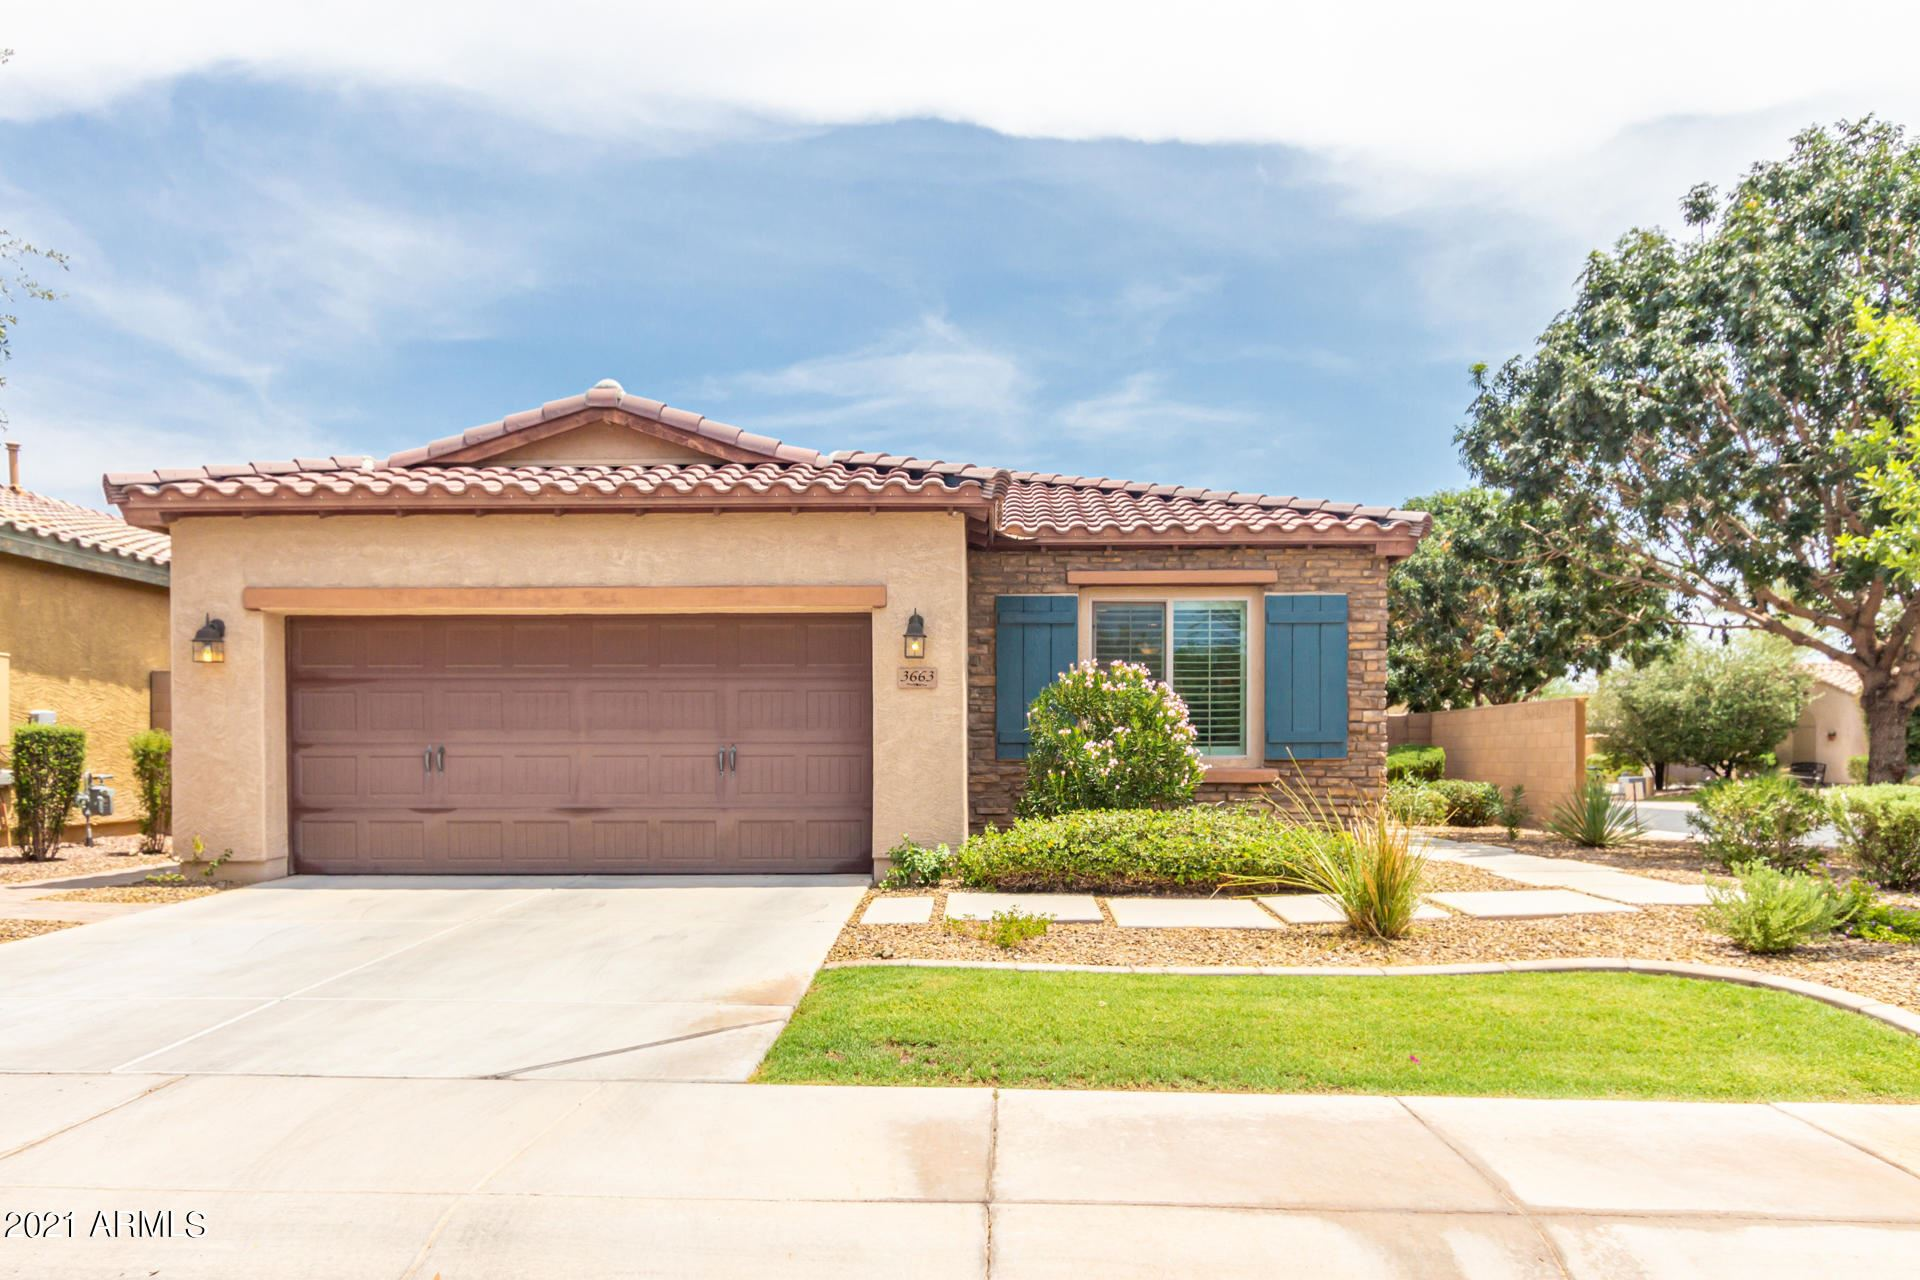 3663 S WASHINGTON Street, Chandler, AZ 85286 - MLS#: 6266764